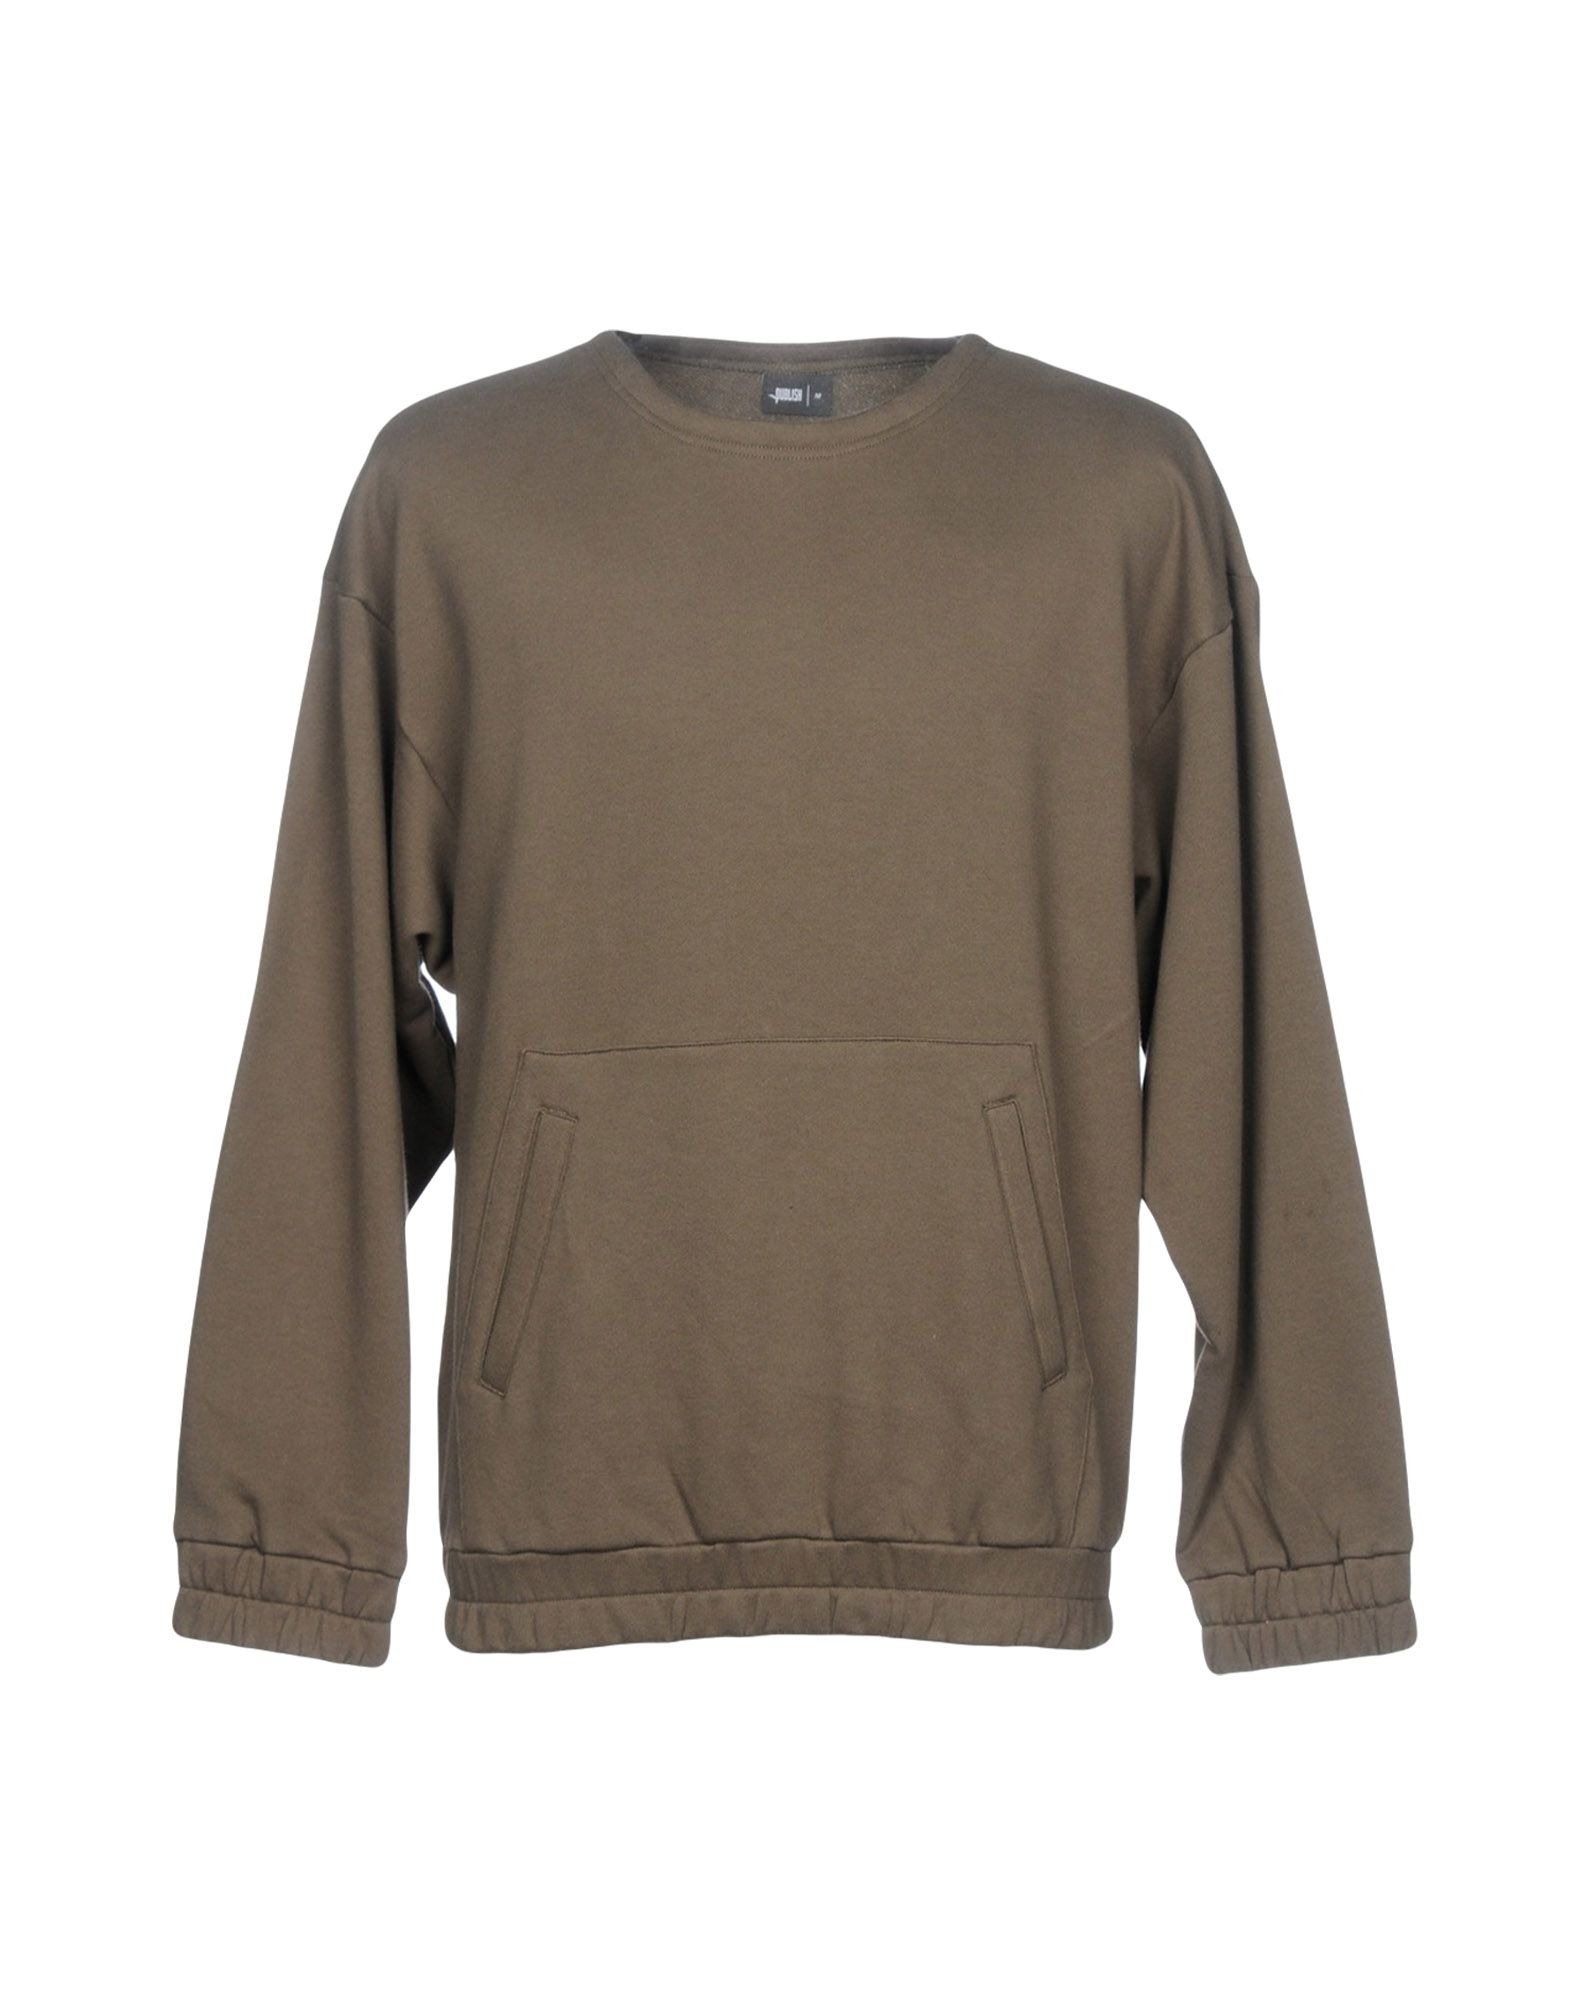 PUBLISH Sweatshirt in Military Green